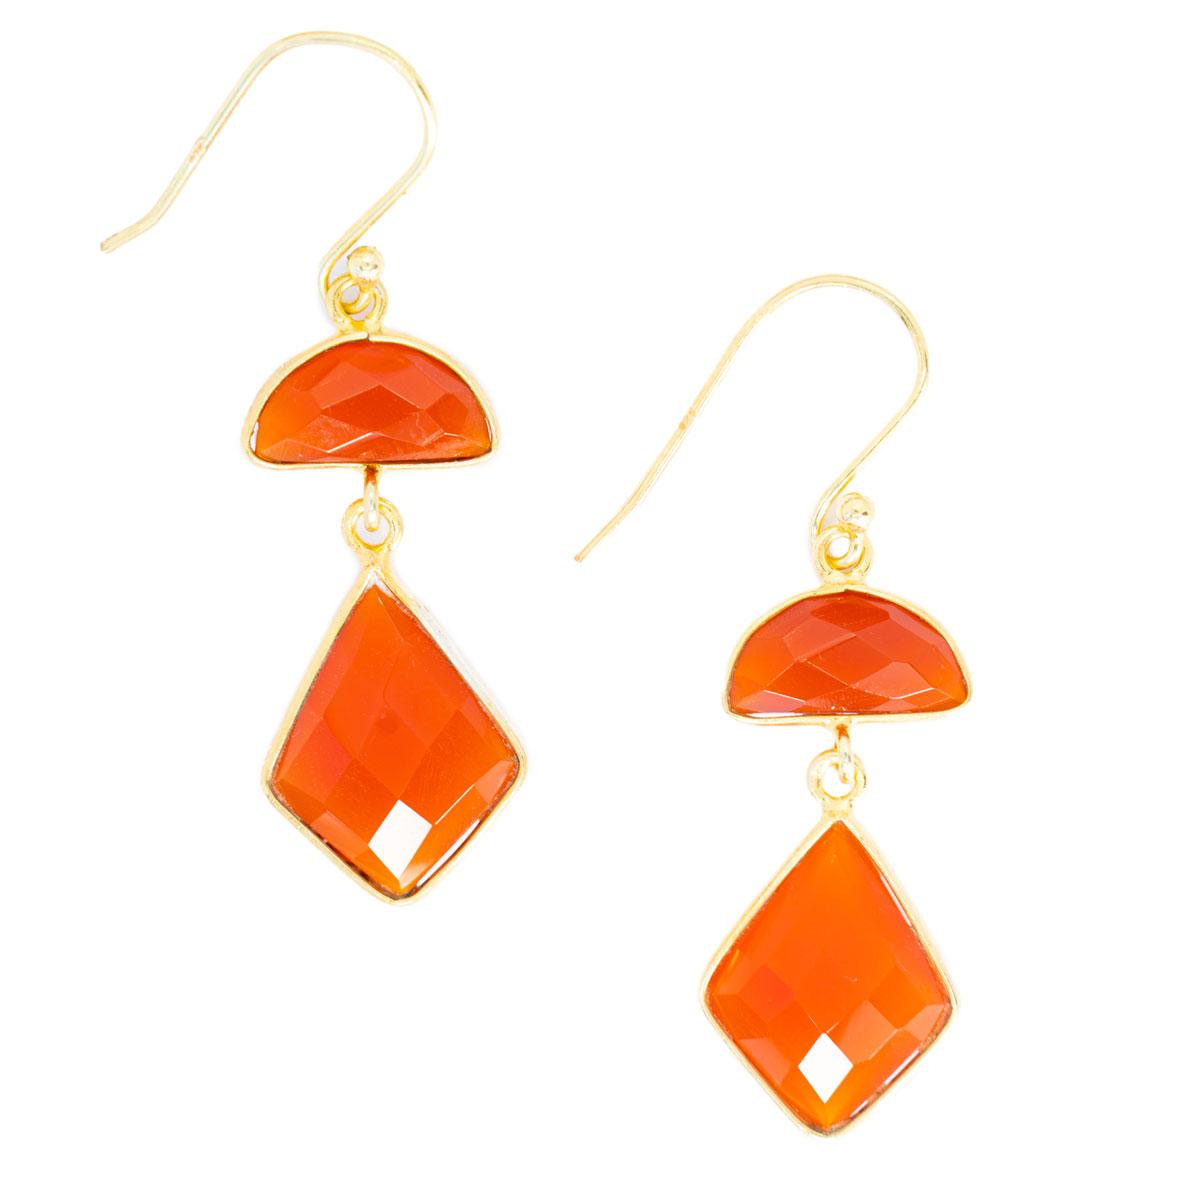 Sri Avinash Infused™ Honey Onyx Earrings - Lightness & Joy Infusion